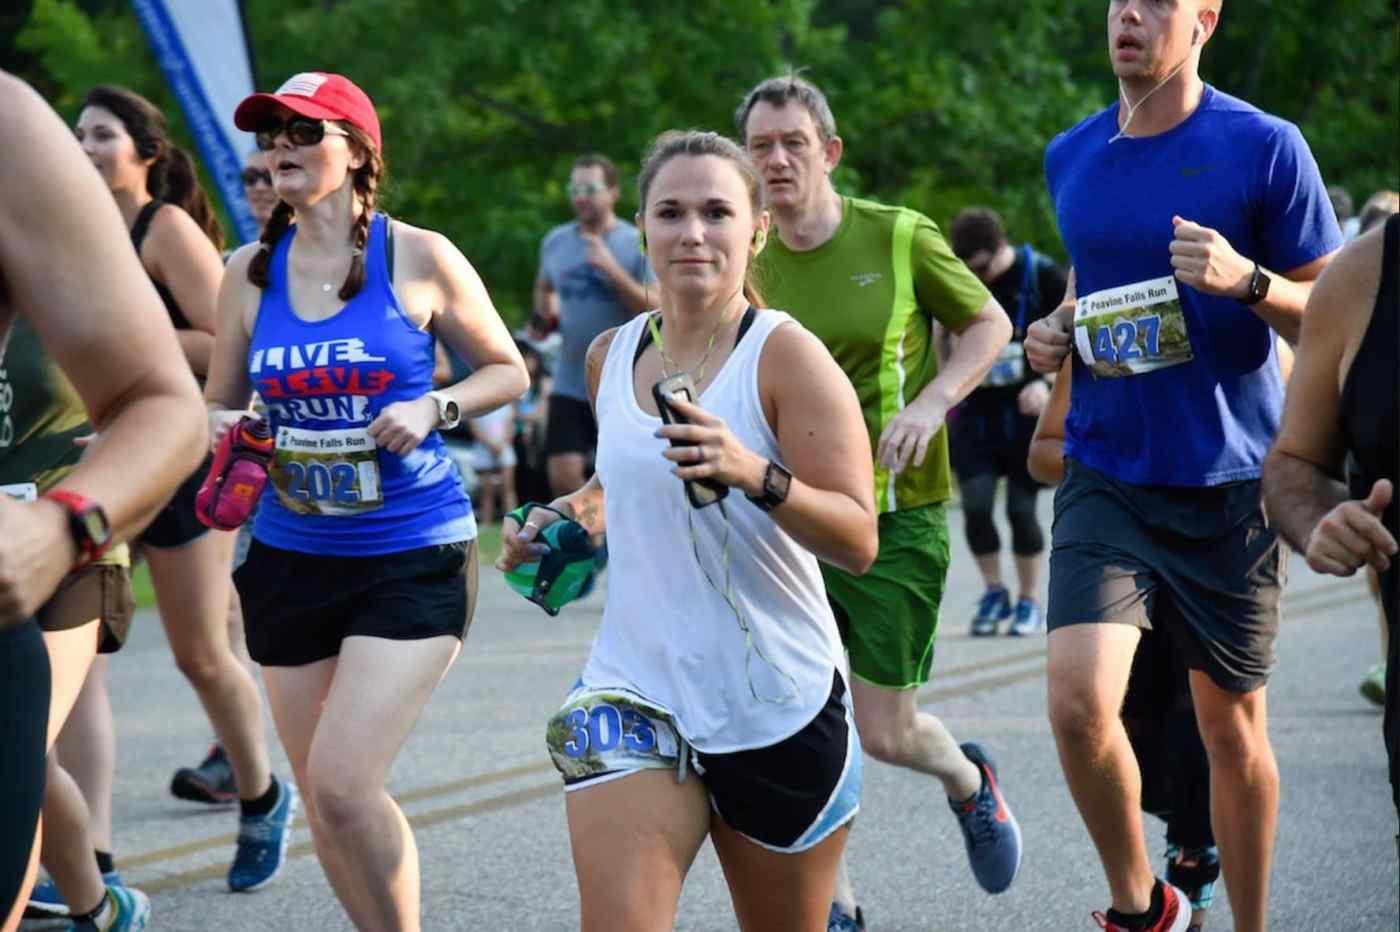 Birmingham, Vulcan 10K, fundraising walks, fundraising runs, marathons